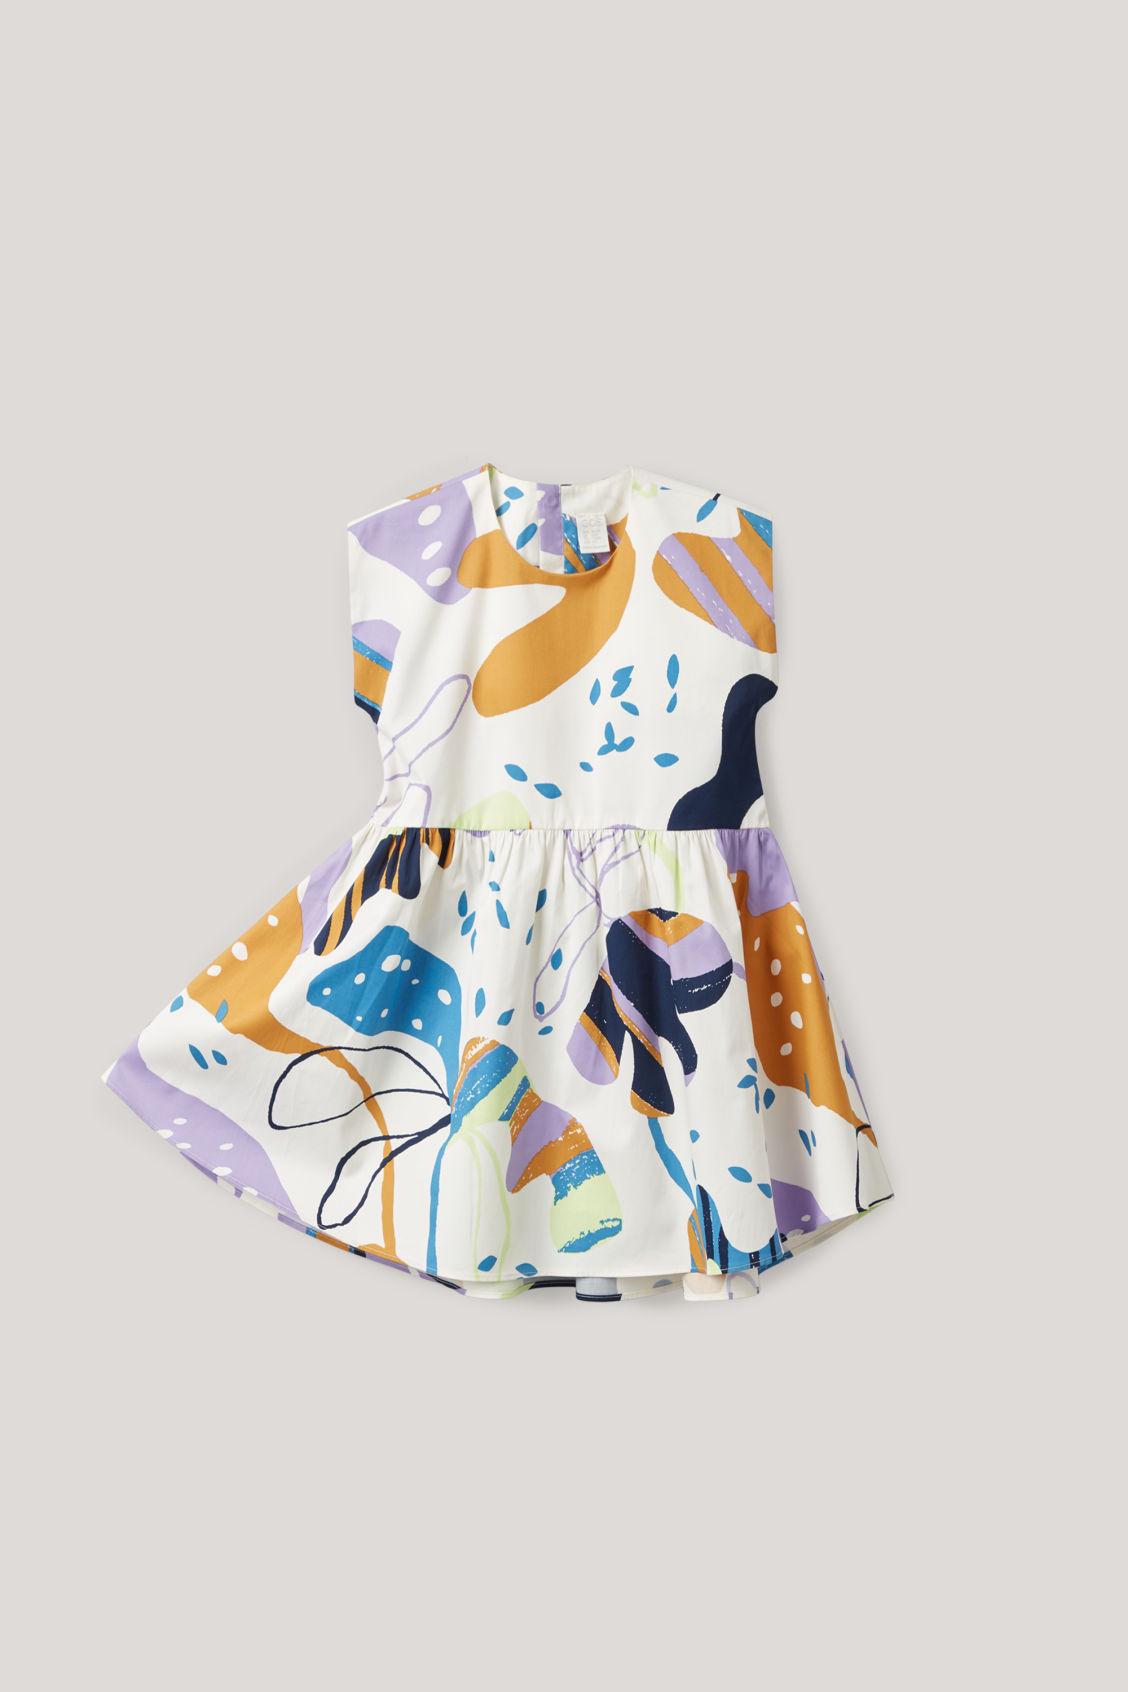 Cos Kids' Printed Sleeveless Dress In White